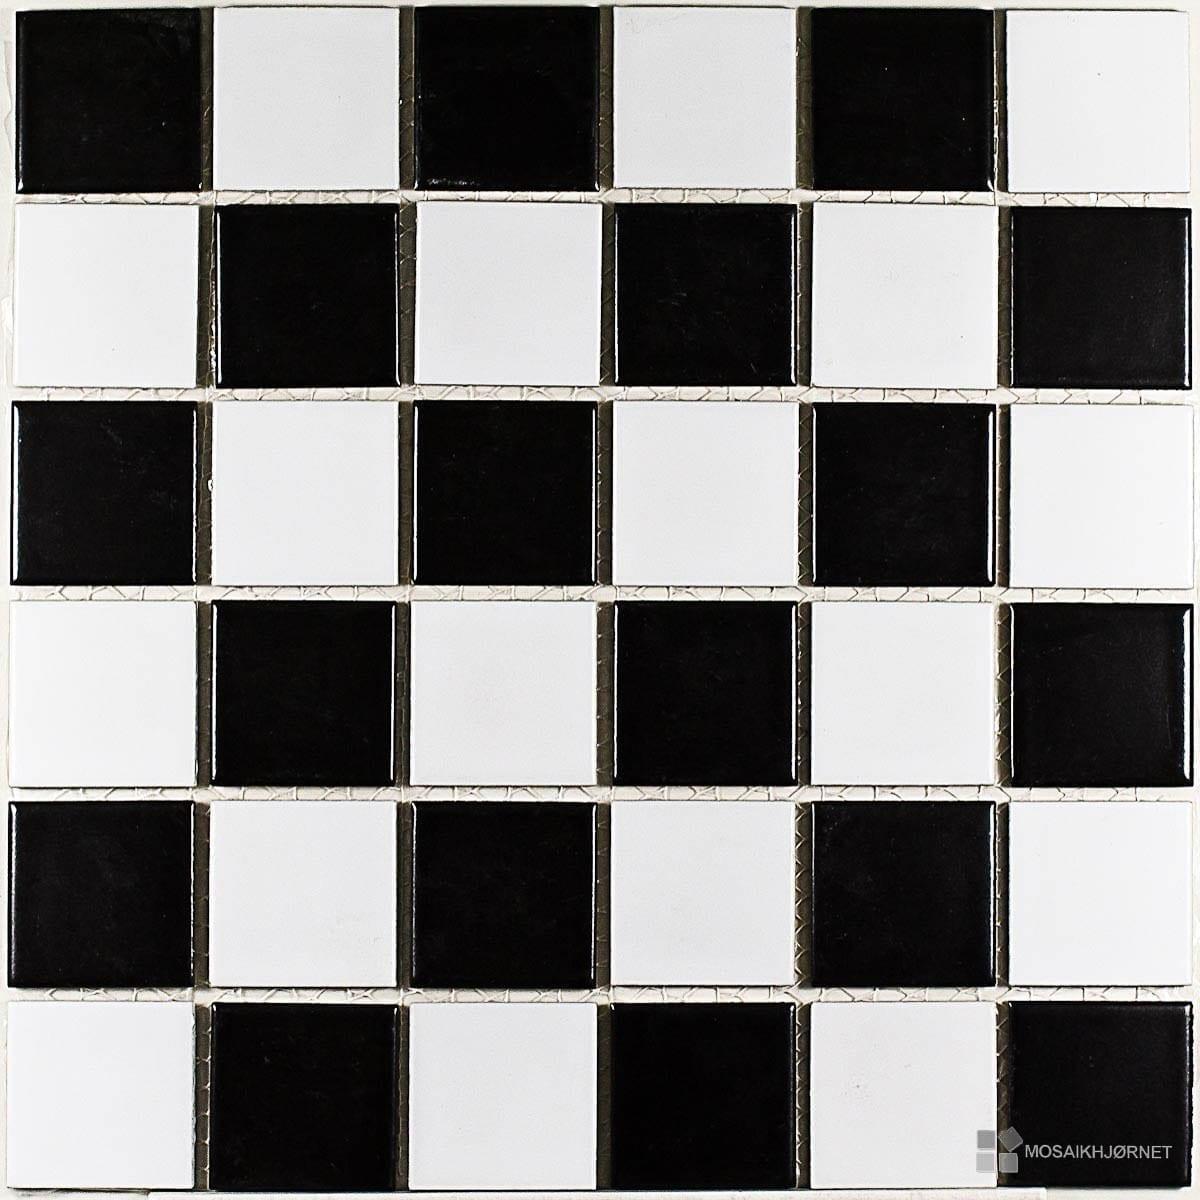 #595146 Mest effektive 5x5 Mimo 99 Skaktern Sort/Hvid Mosaikhjørnet Fliser Klinker Og Mosaik Ti  Fliser Til Bad Og Køkken 4805 120012004805